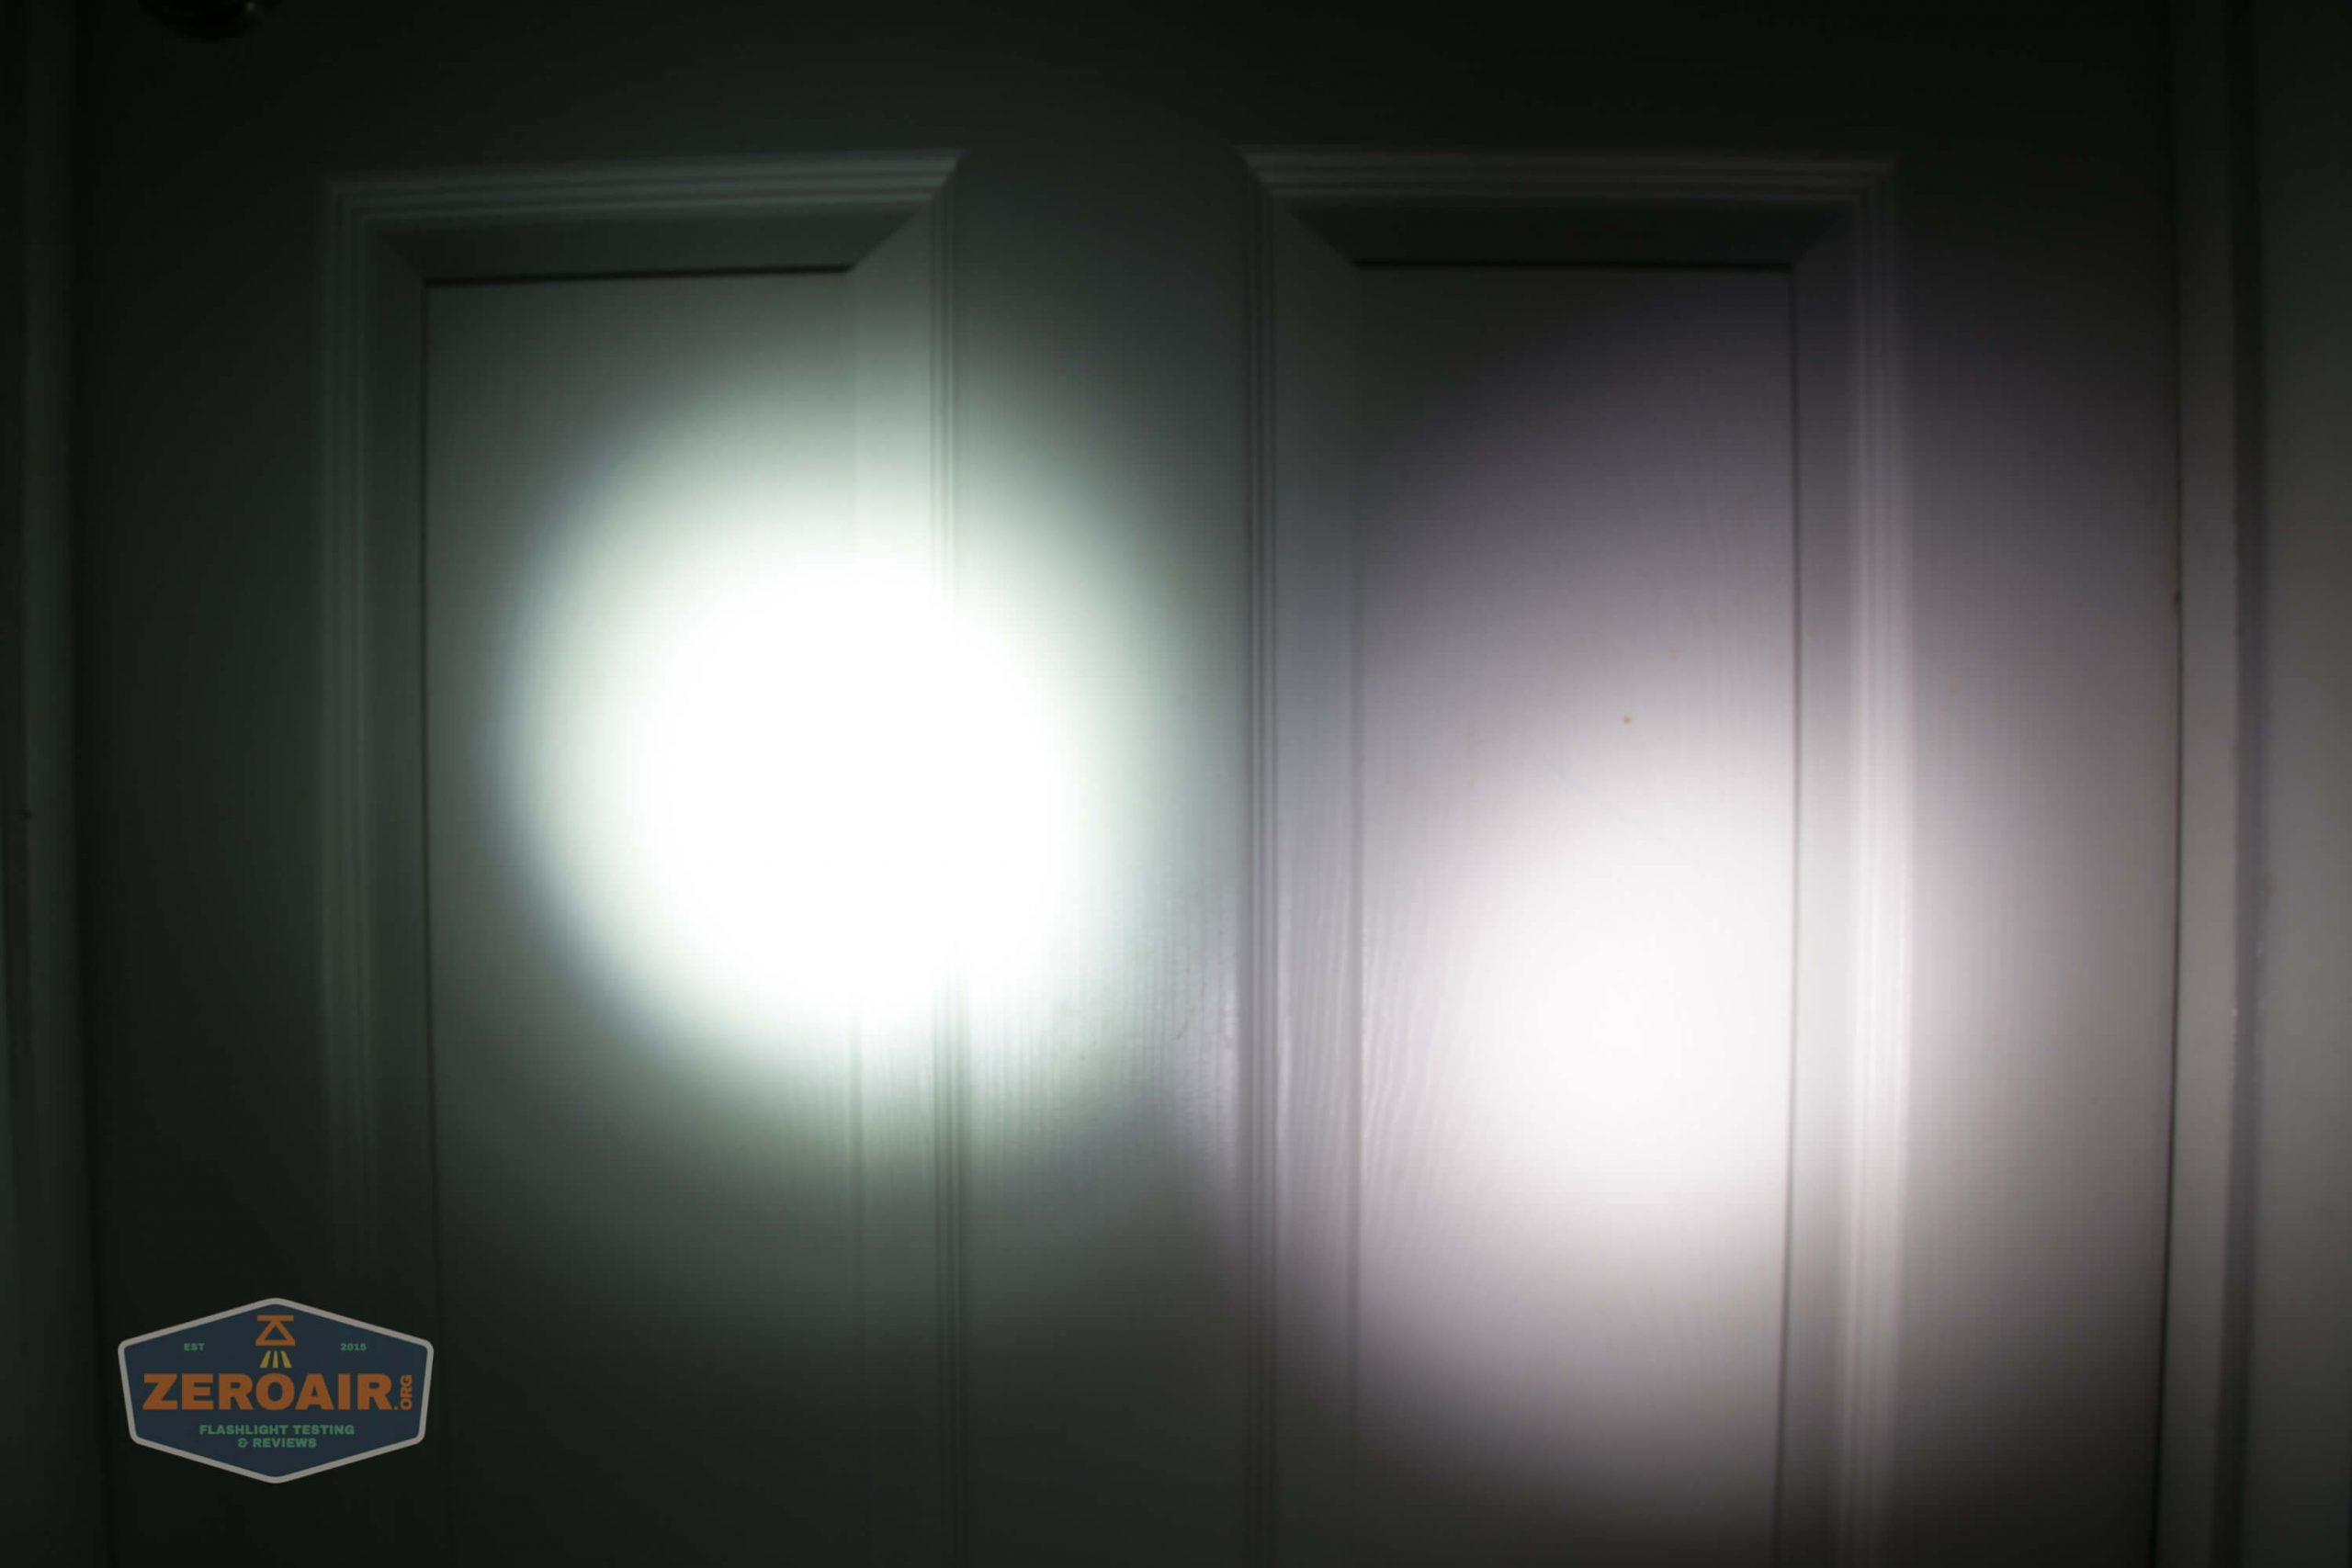 fireflylite e01 luminus sst-40 21700 beamshot door vs blf-348 3